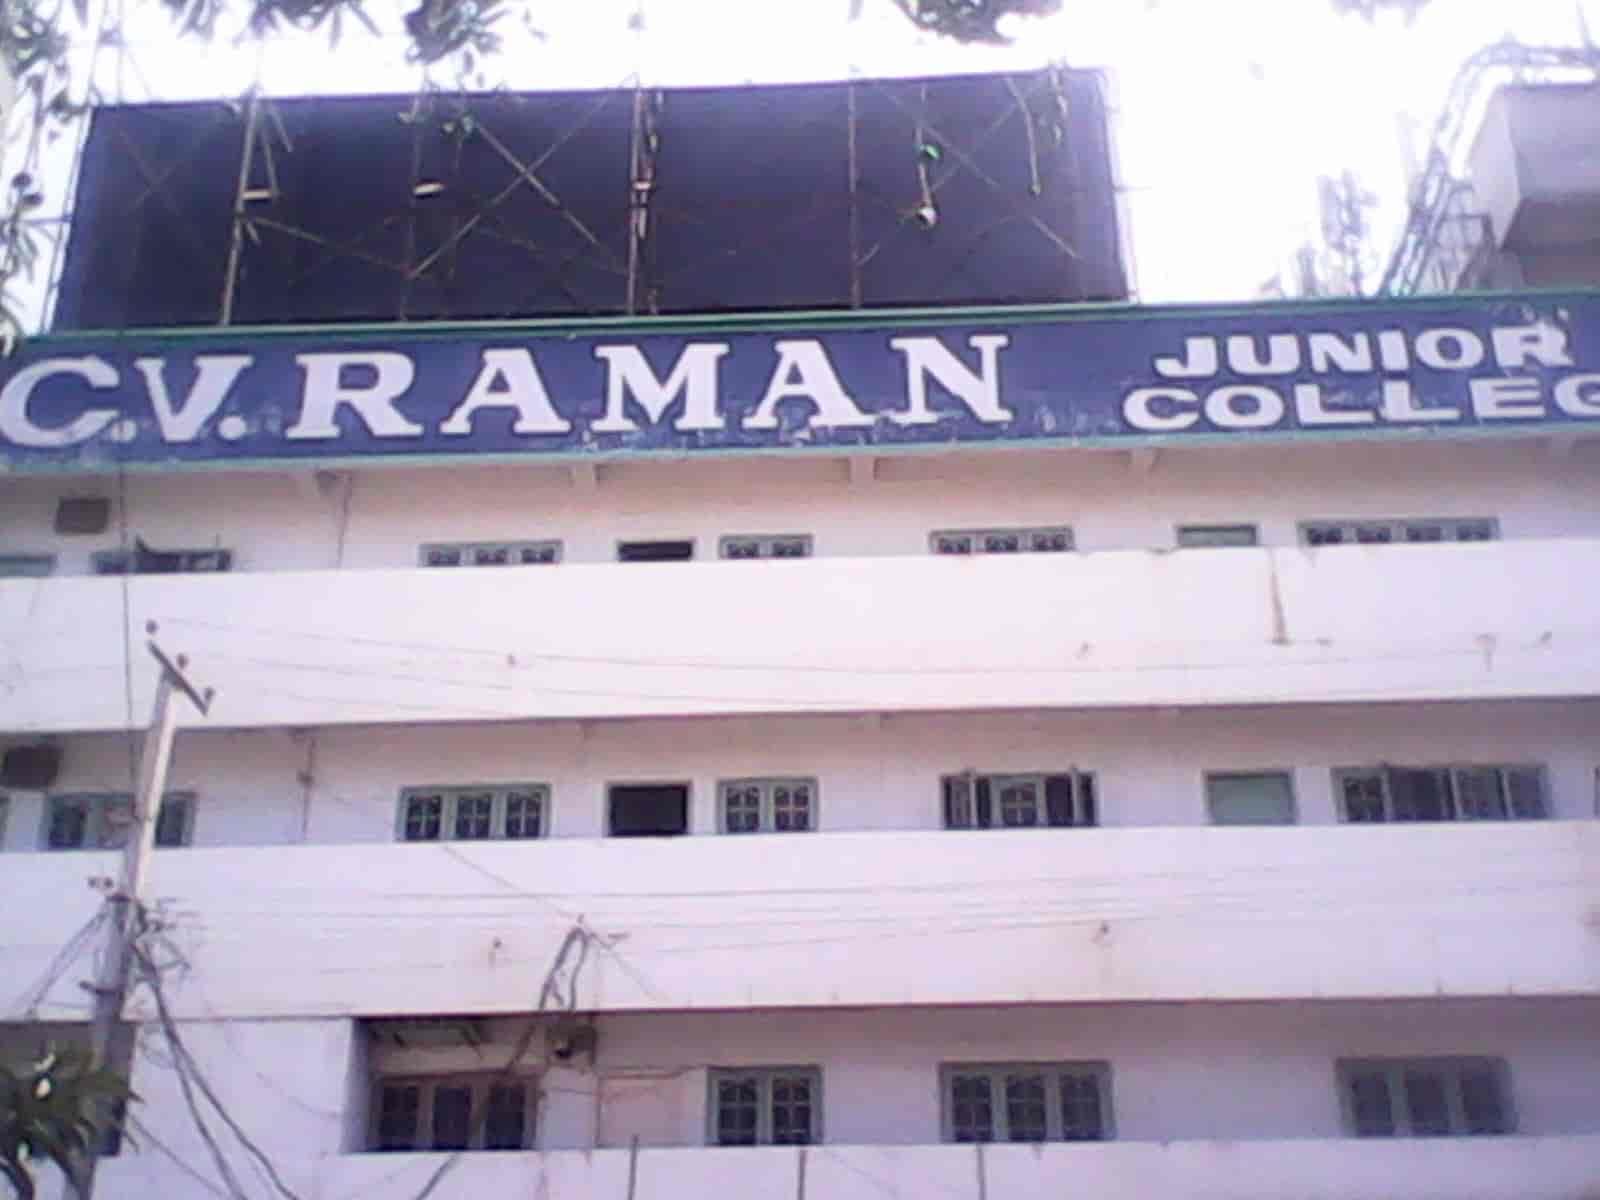 c v raman junior college colleges in kurnool justdial